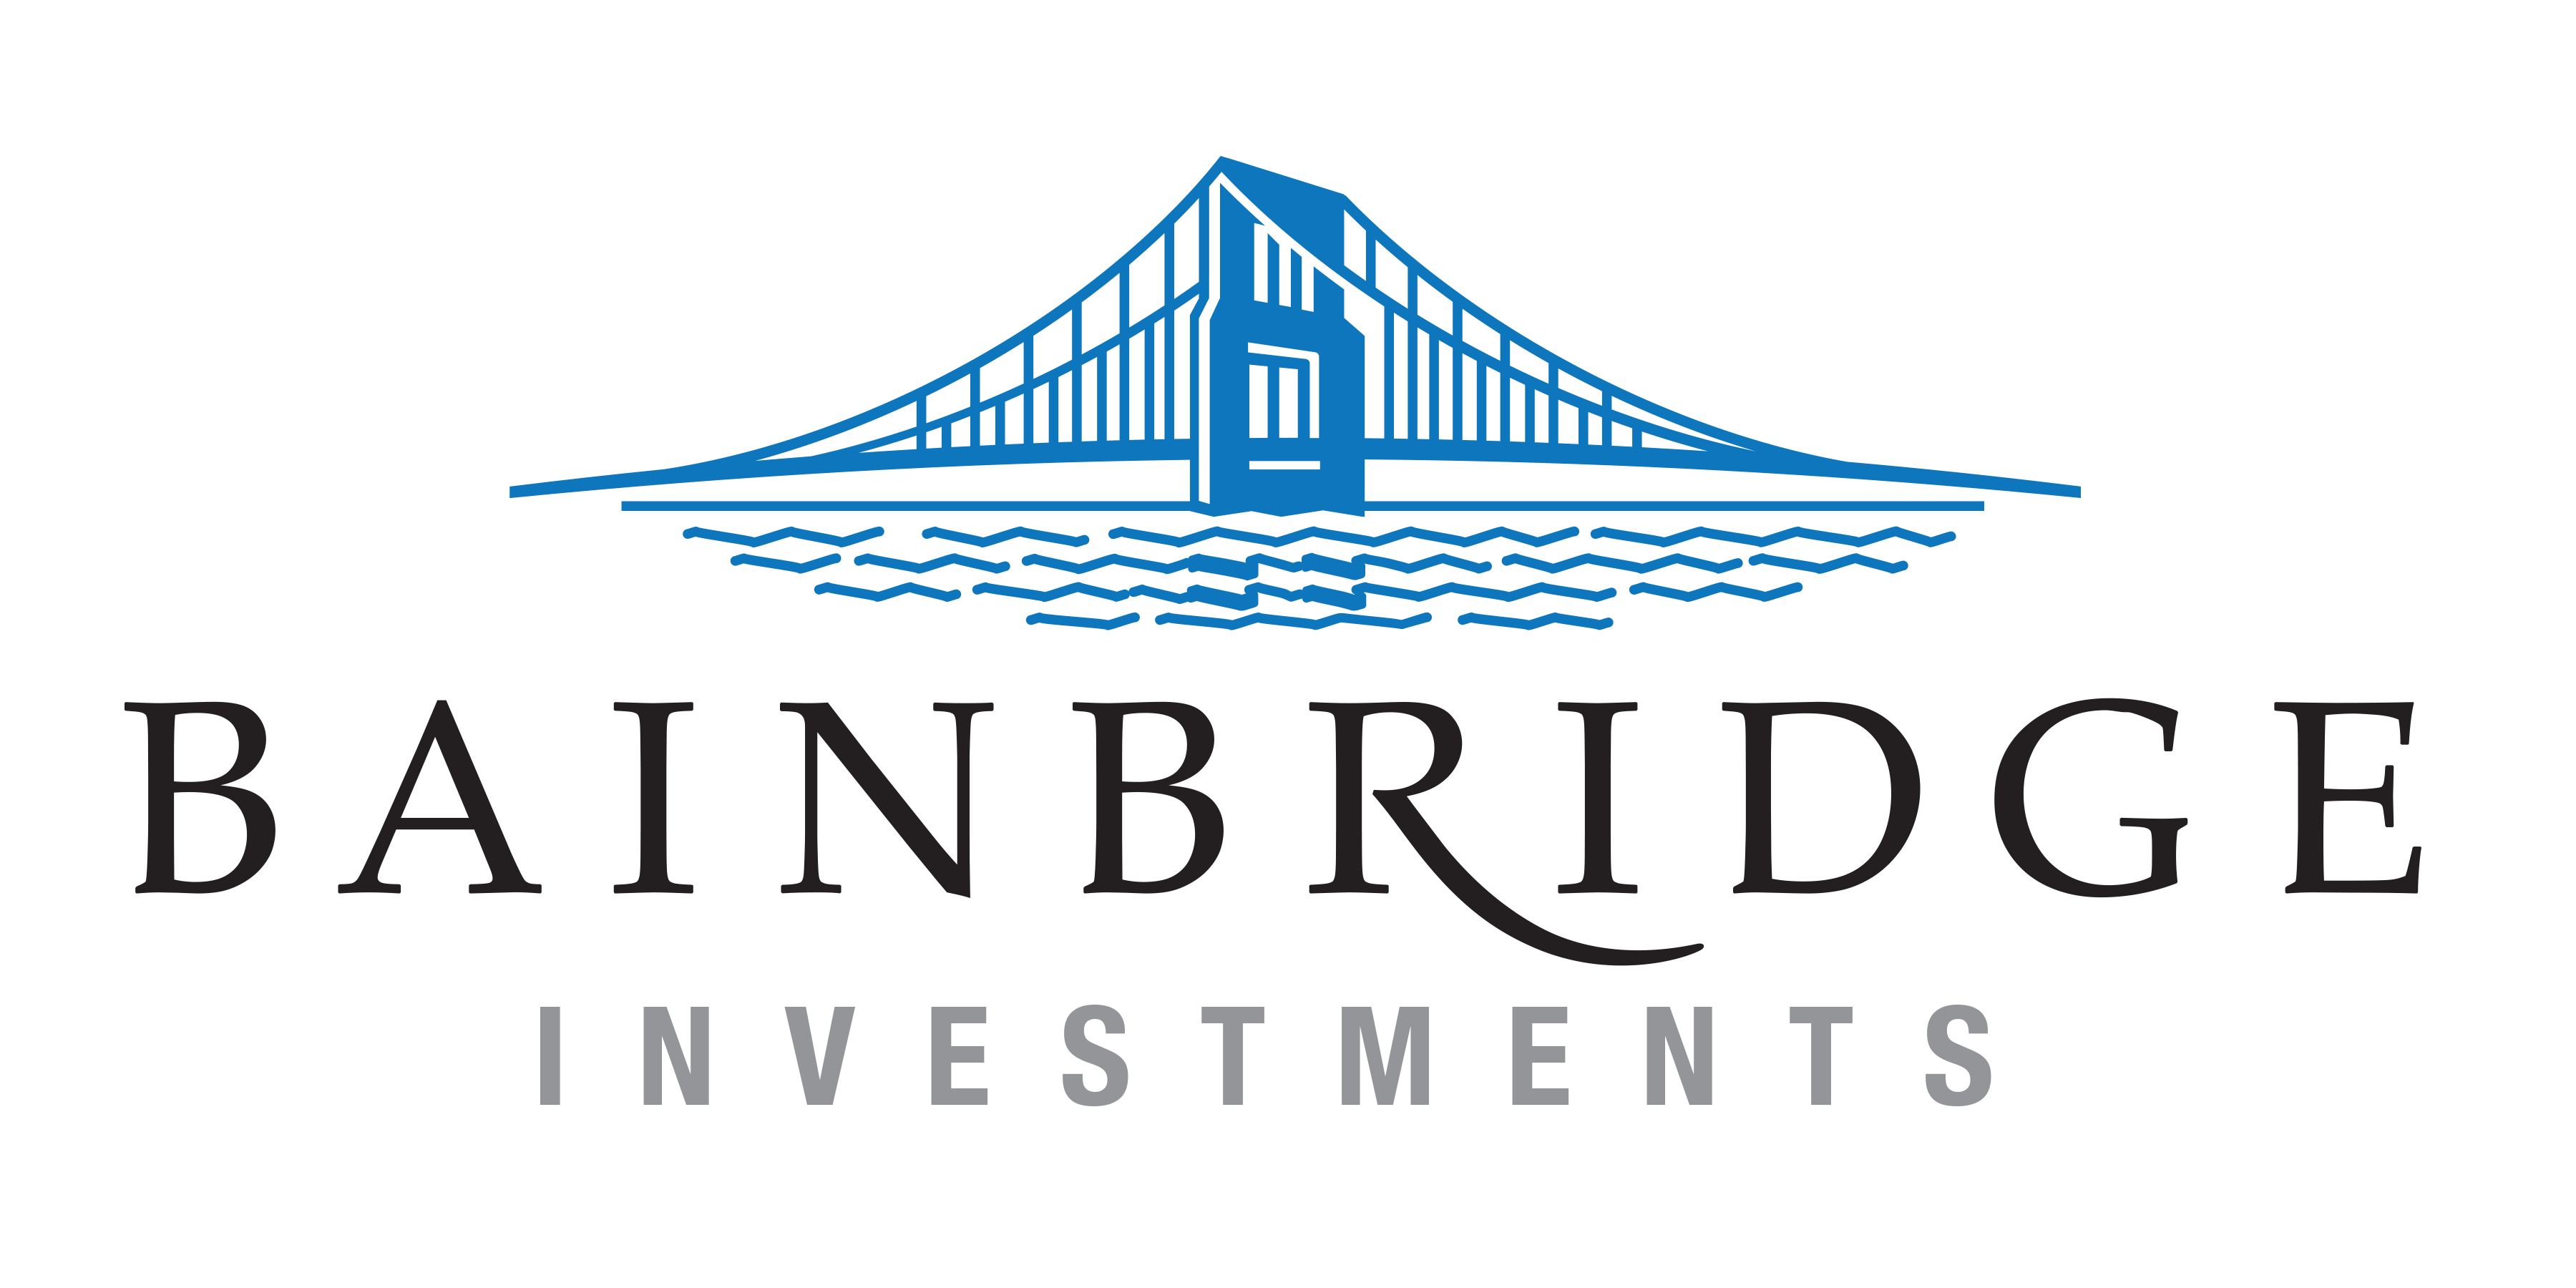 Bainbridge Investments Bainbridge Hershiser Income Fund